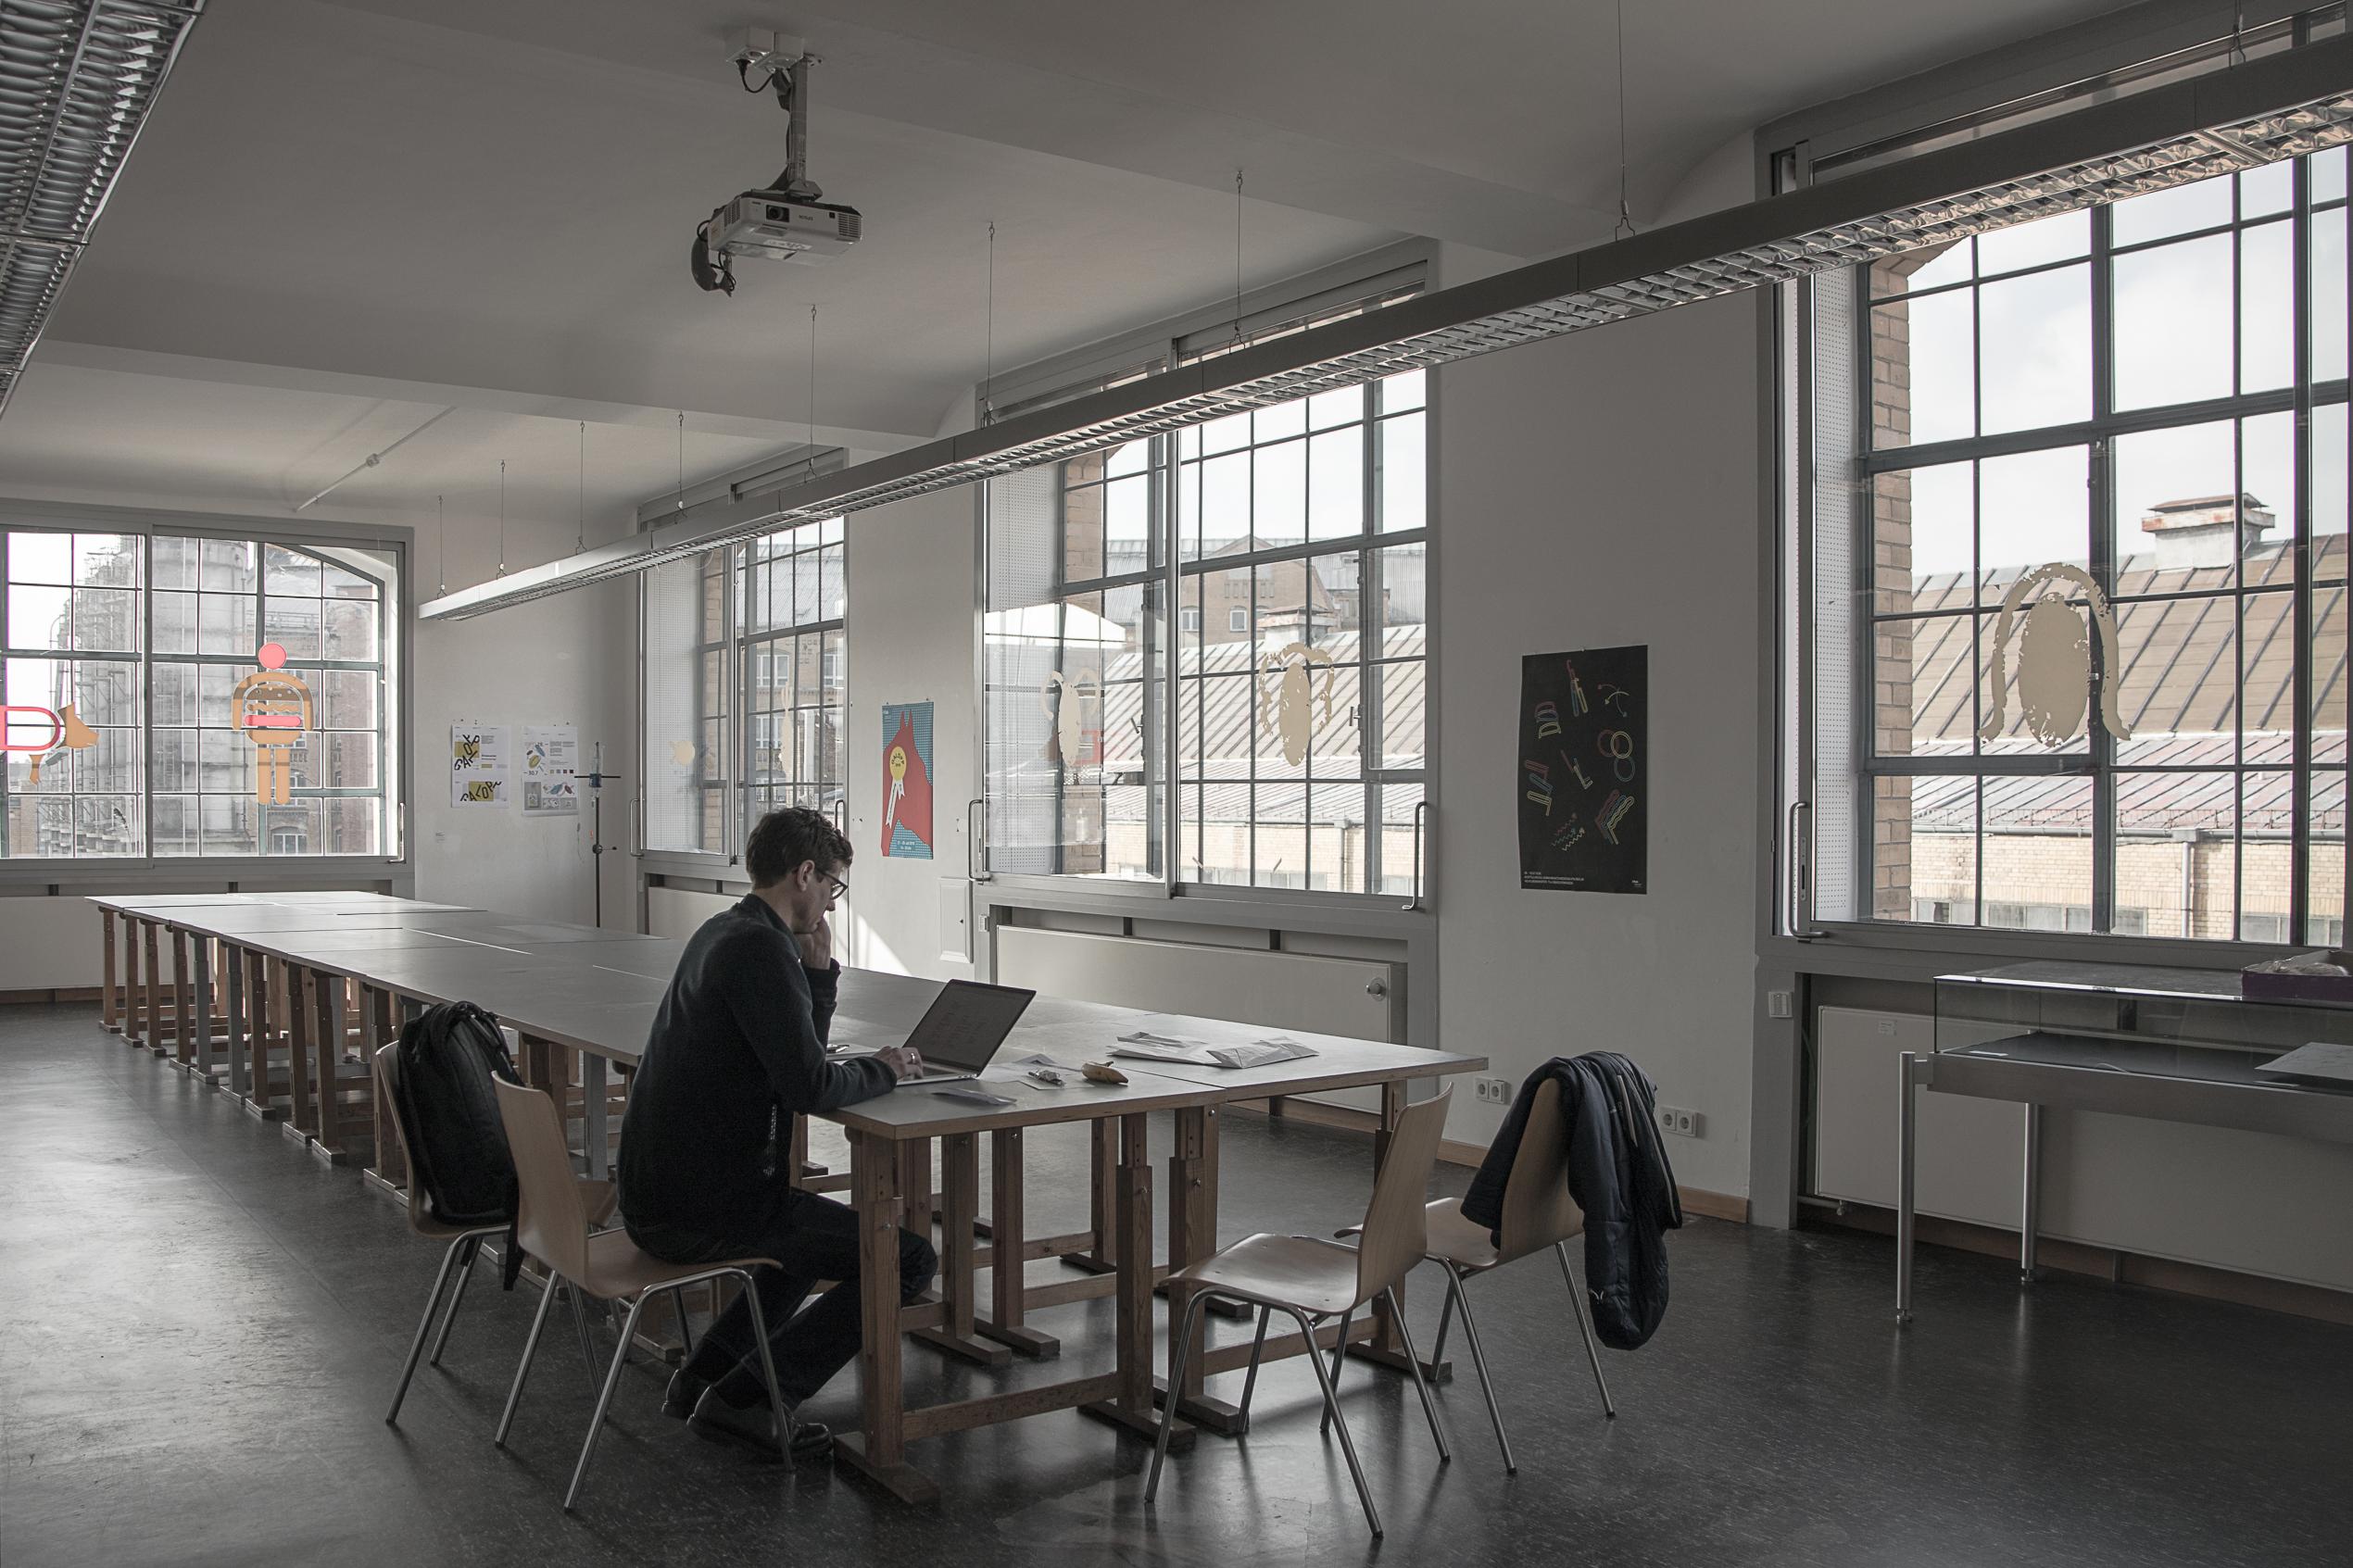 Fixe Schnitzel 2018 – Kommunikationsdesign HTW Berlin